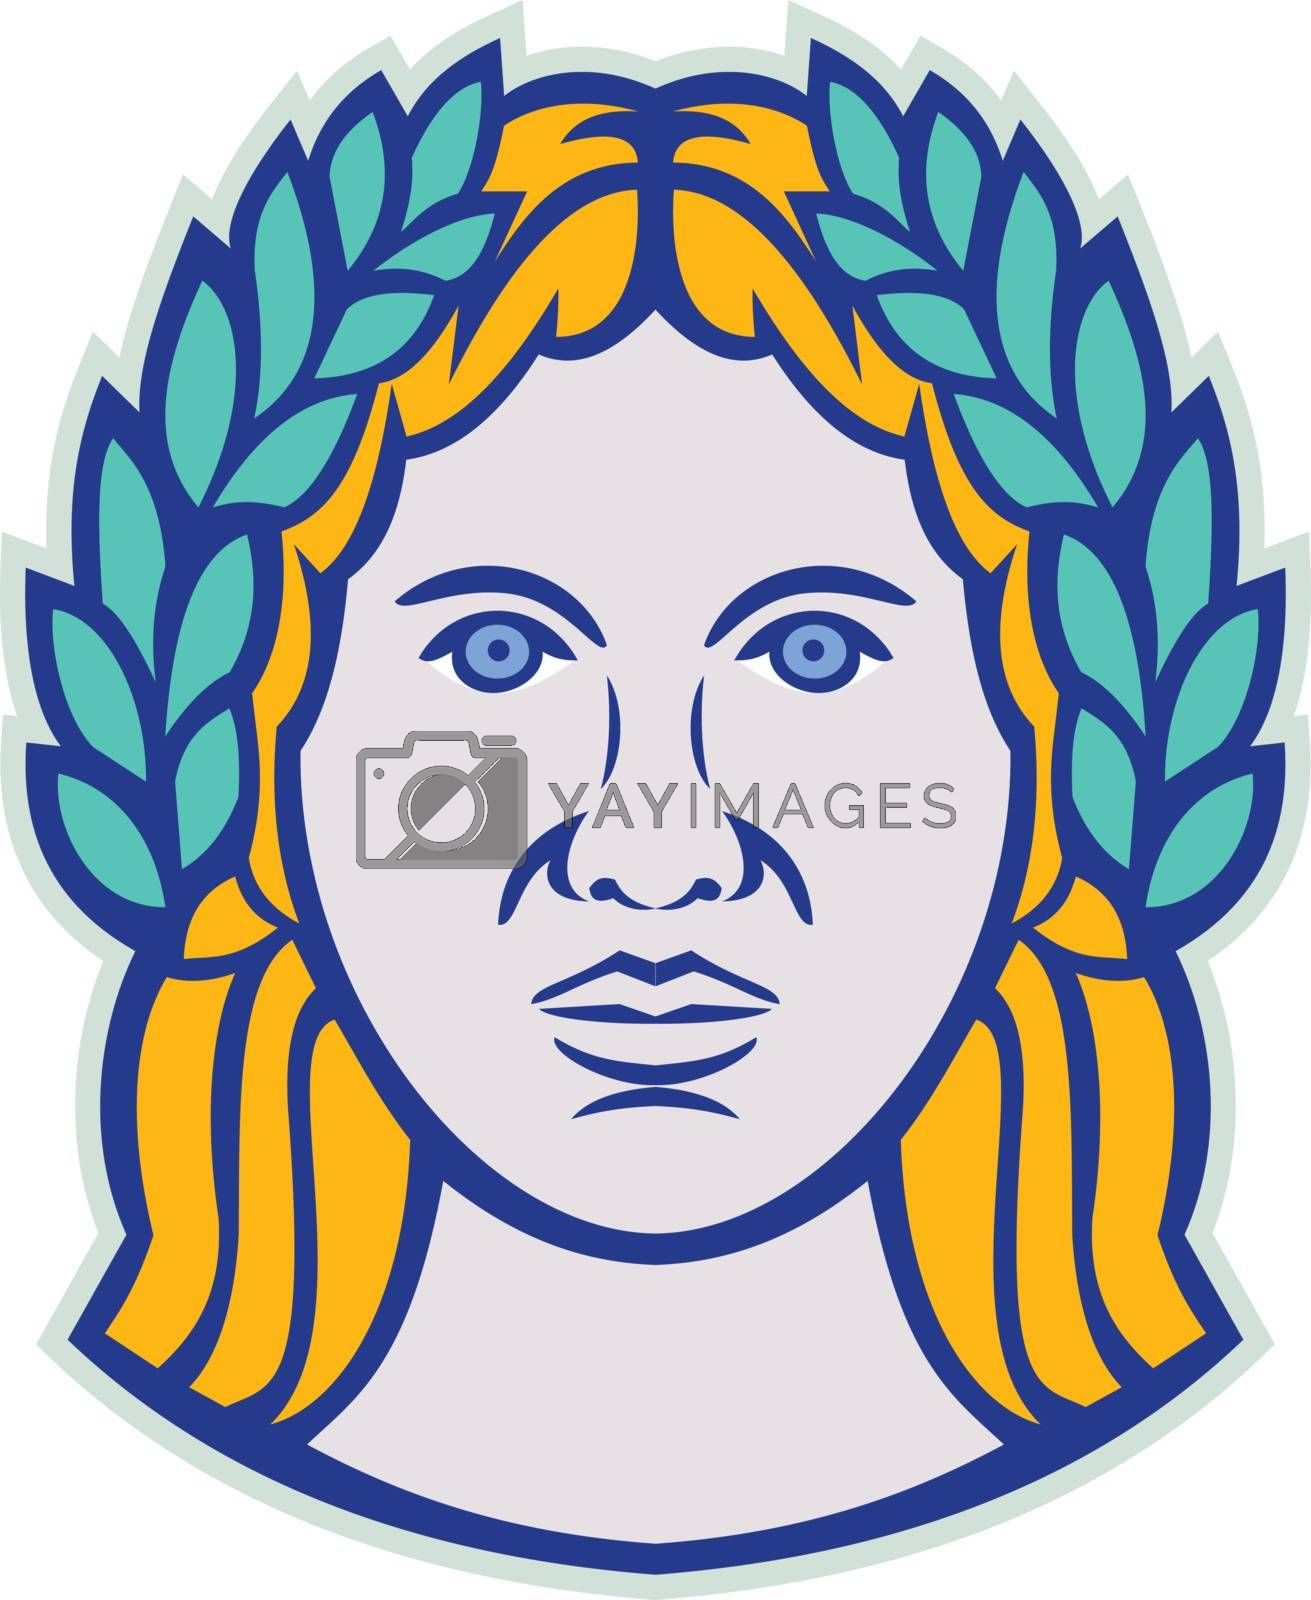 Ceres Roman Agricultural Deity Mascot by patrimonio